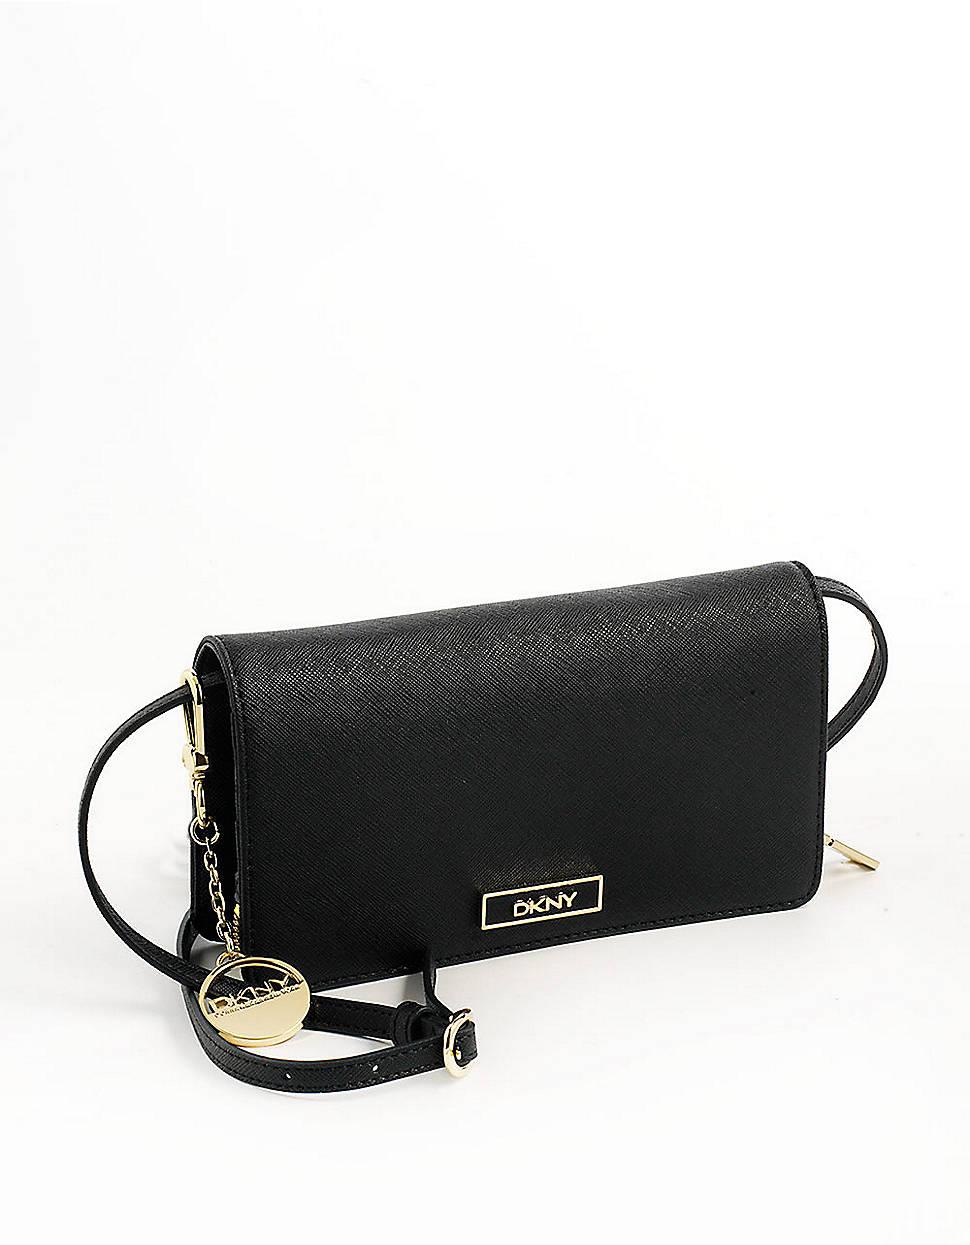 405f34fbd89c Coach Tea Rose Embossed Crossbody Clutch Bag